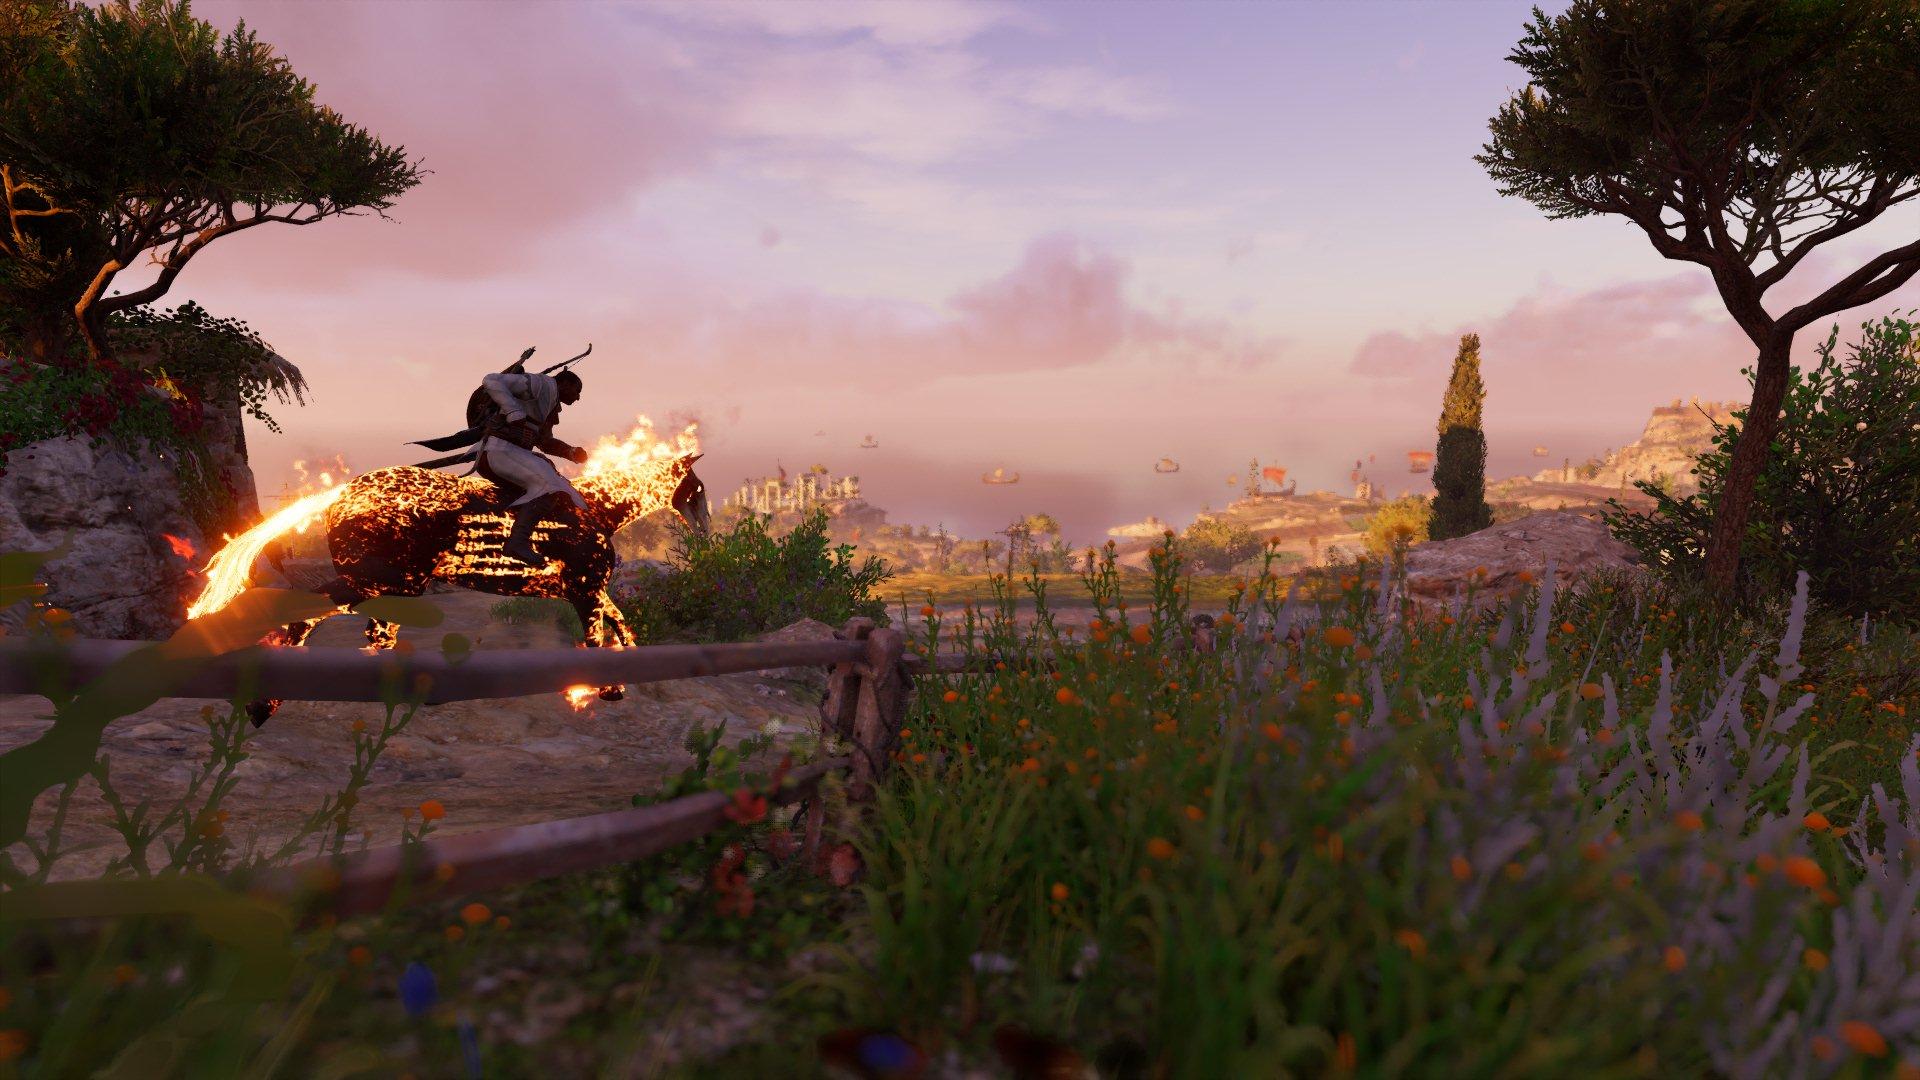 assassin's creed bayek assassin's creed: origins landscape